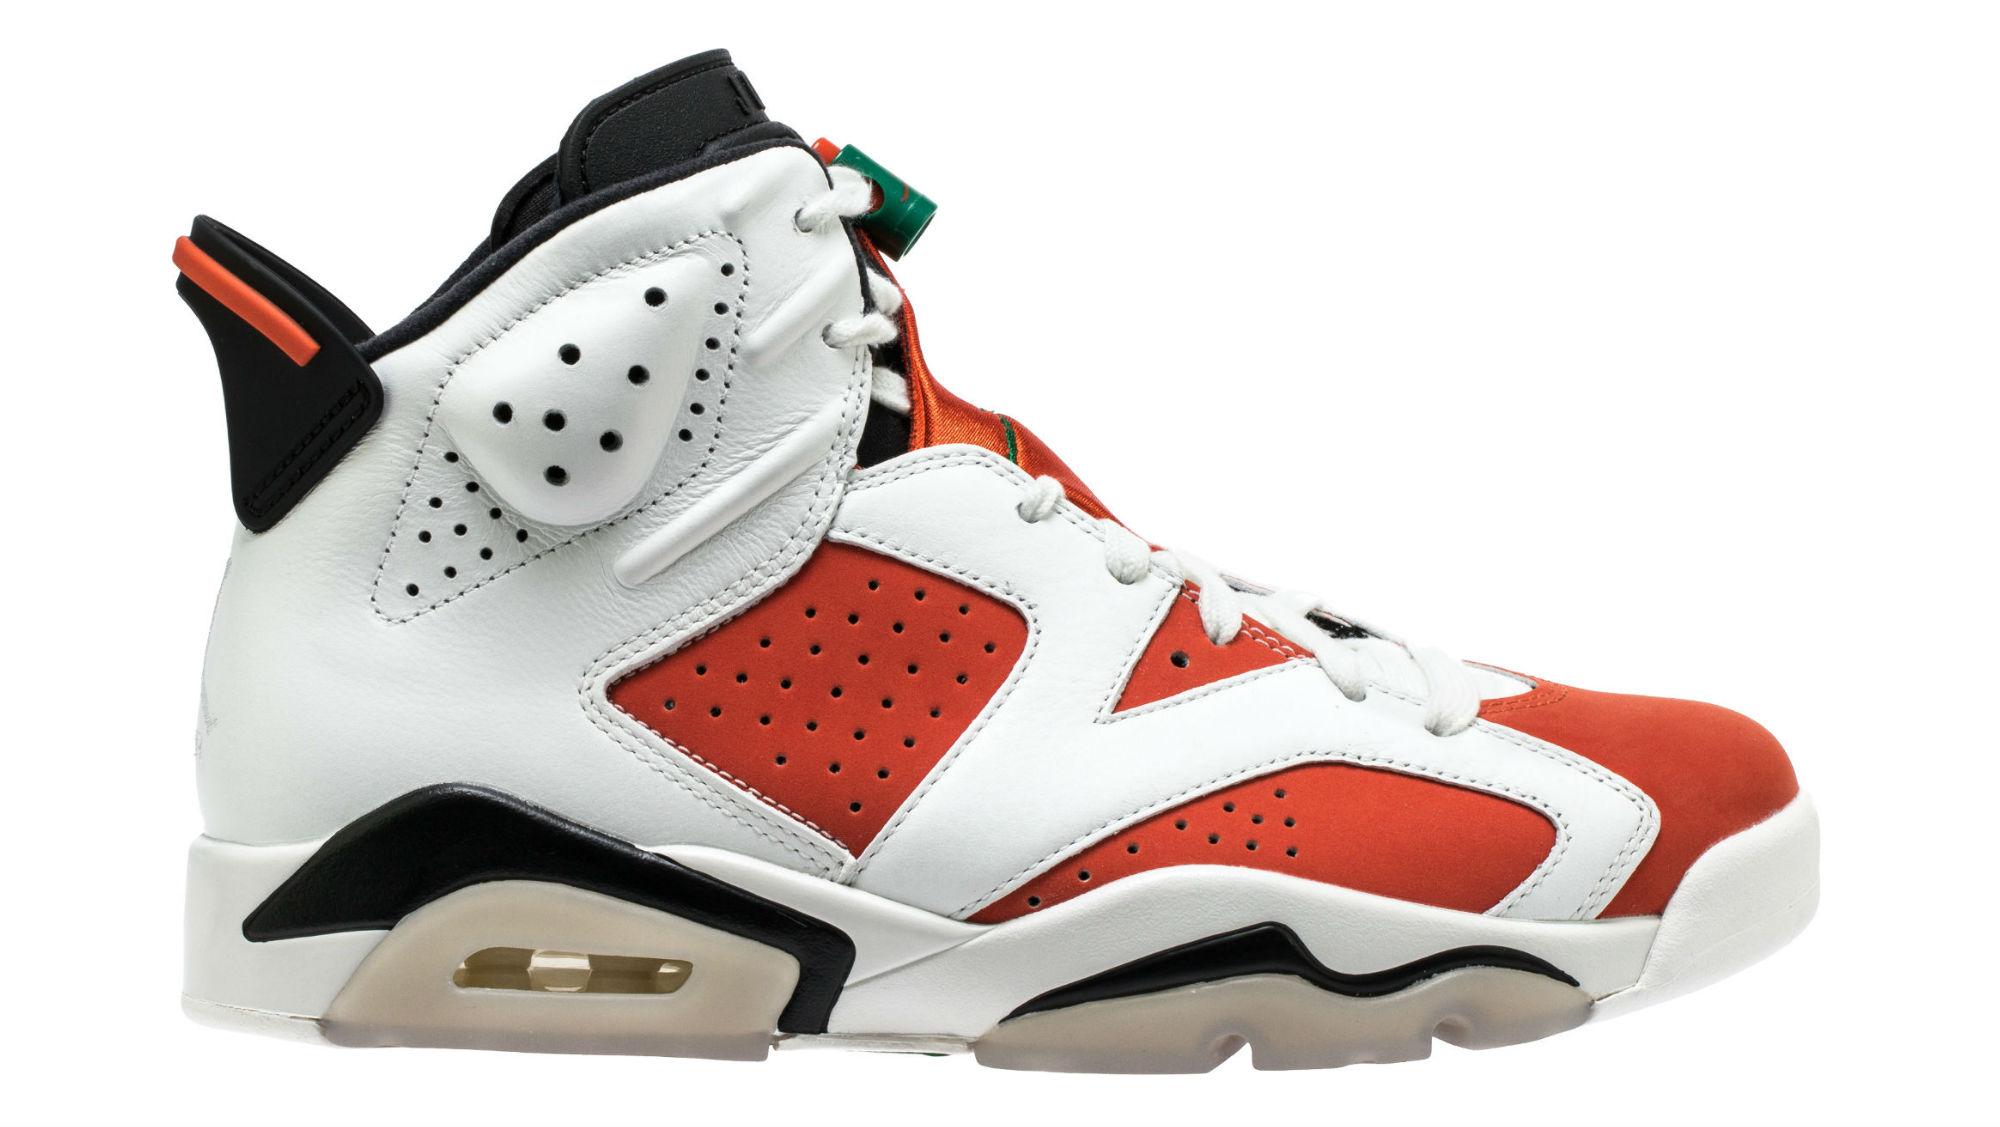 best sneakers 772c6 f7ad1 Footlocker Jordan Retro 13 Brooks Tennis Shoes